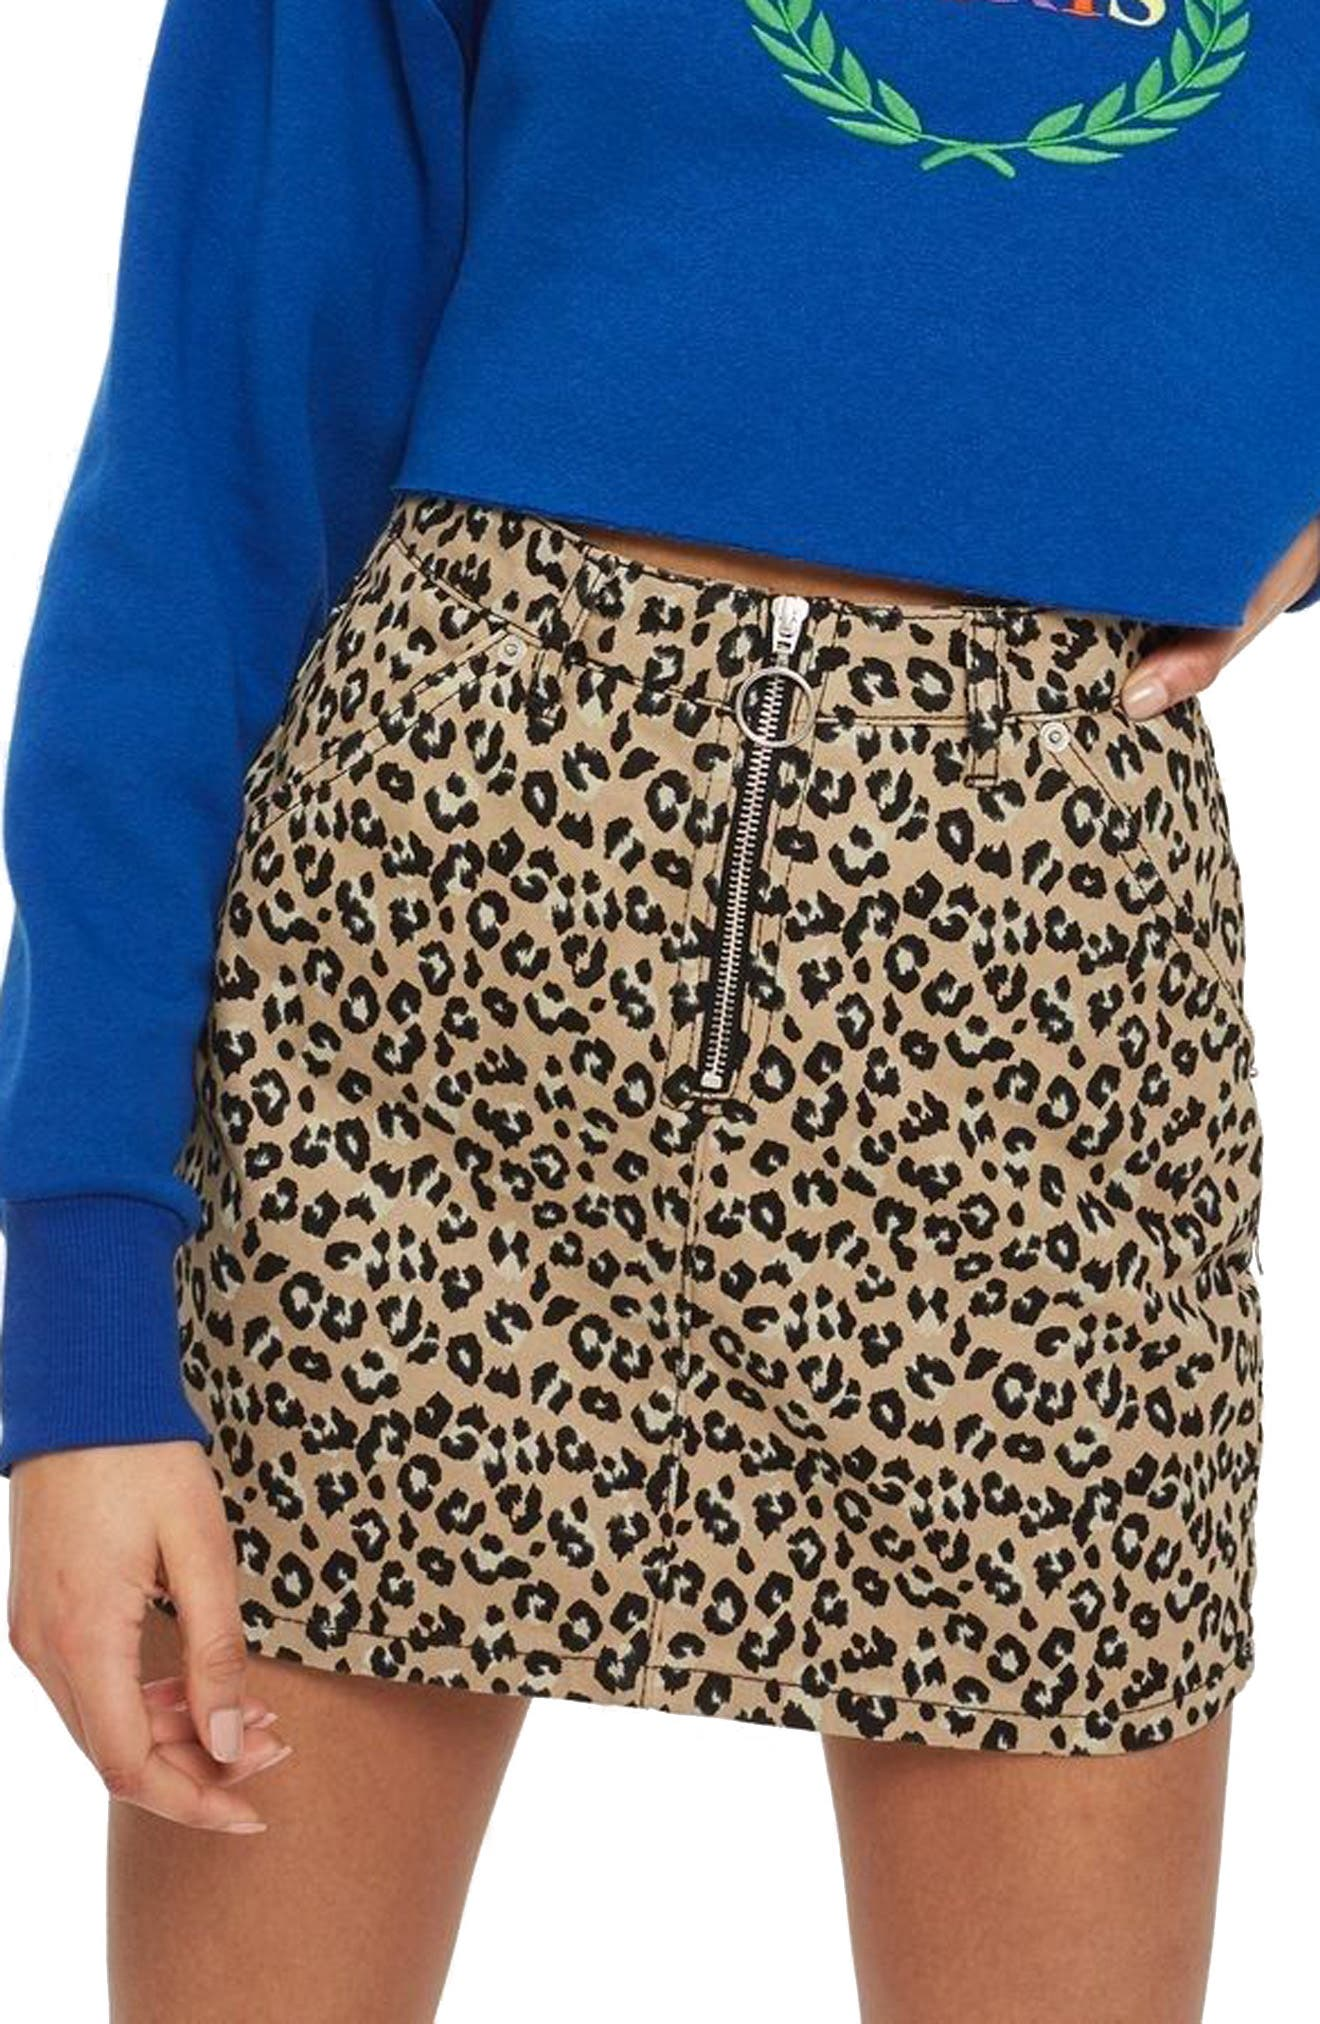 Topshop Half Zip Leopard Print Denim Skirt, US (fits like 0-2) - Brown